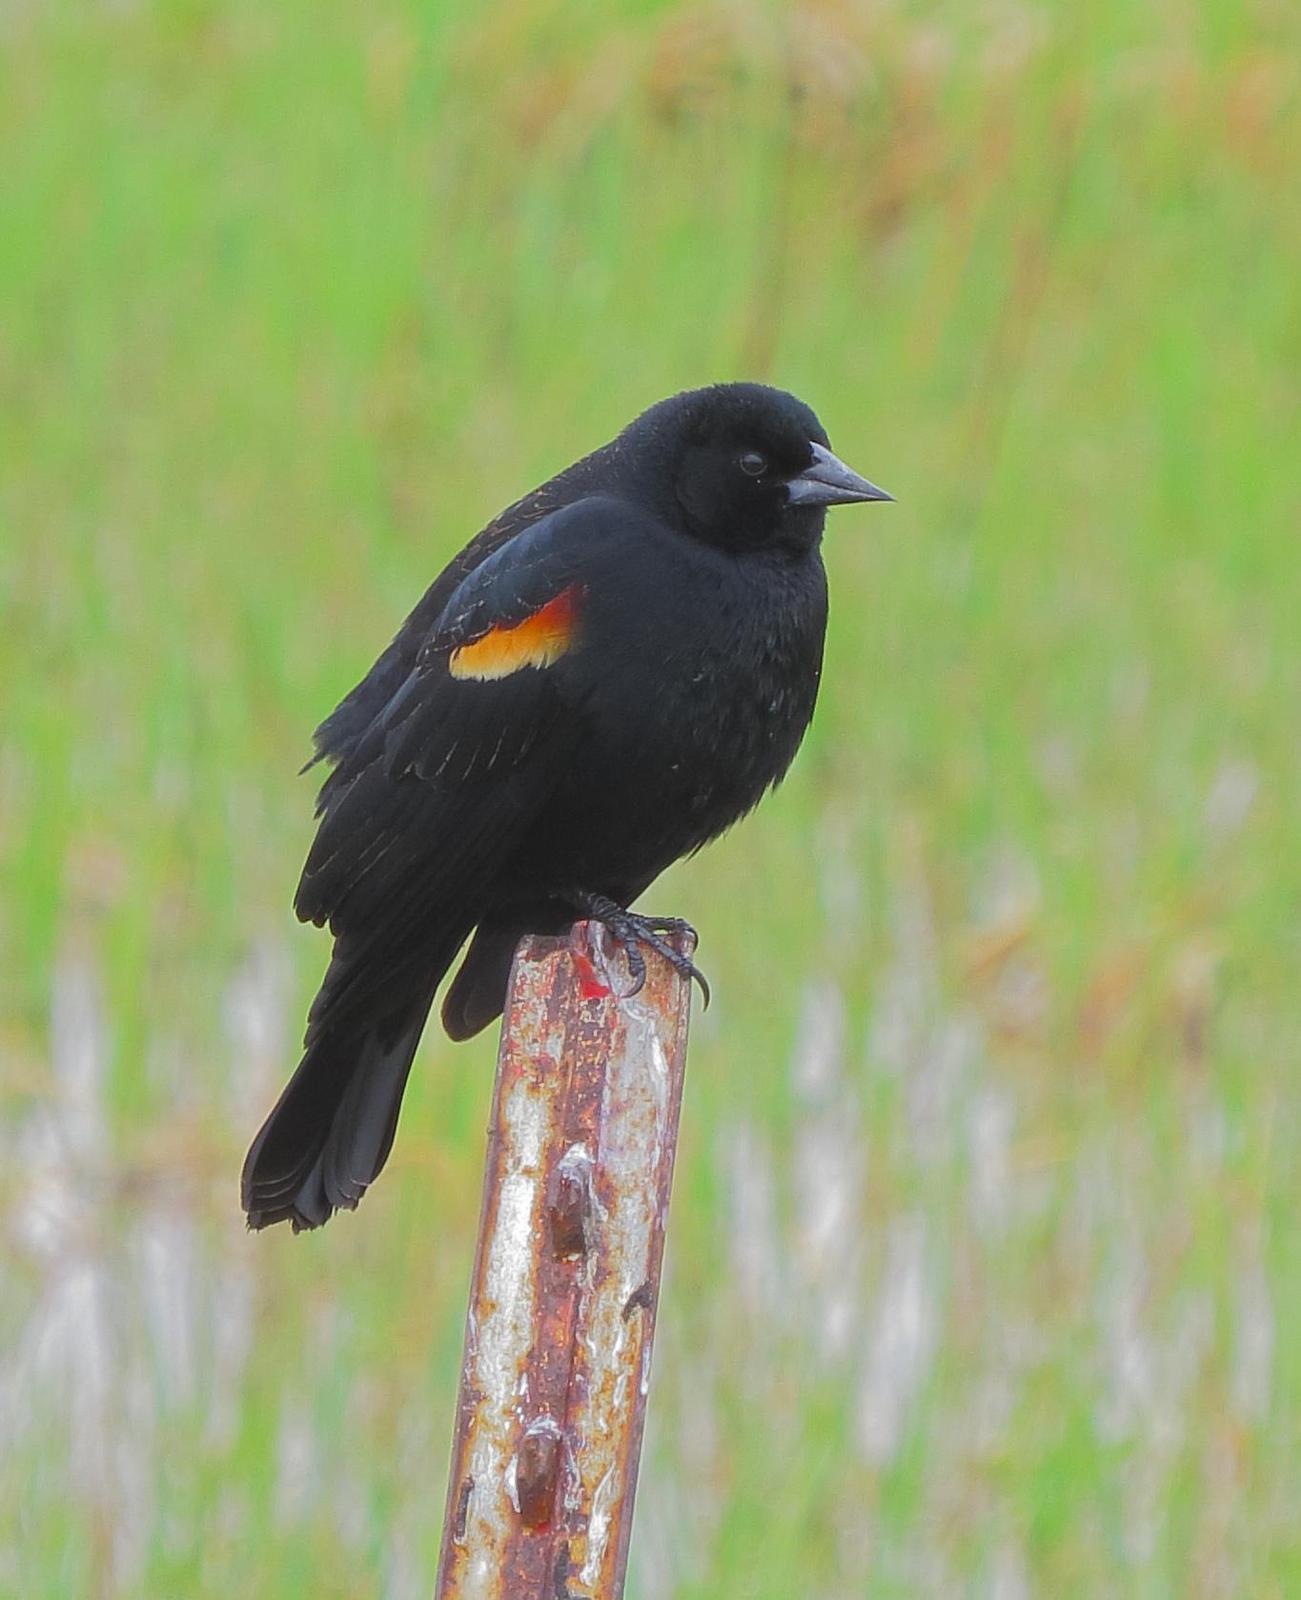 Red-winged Blackbird Photo by Kent Jensen